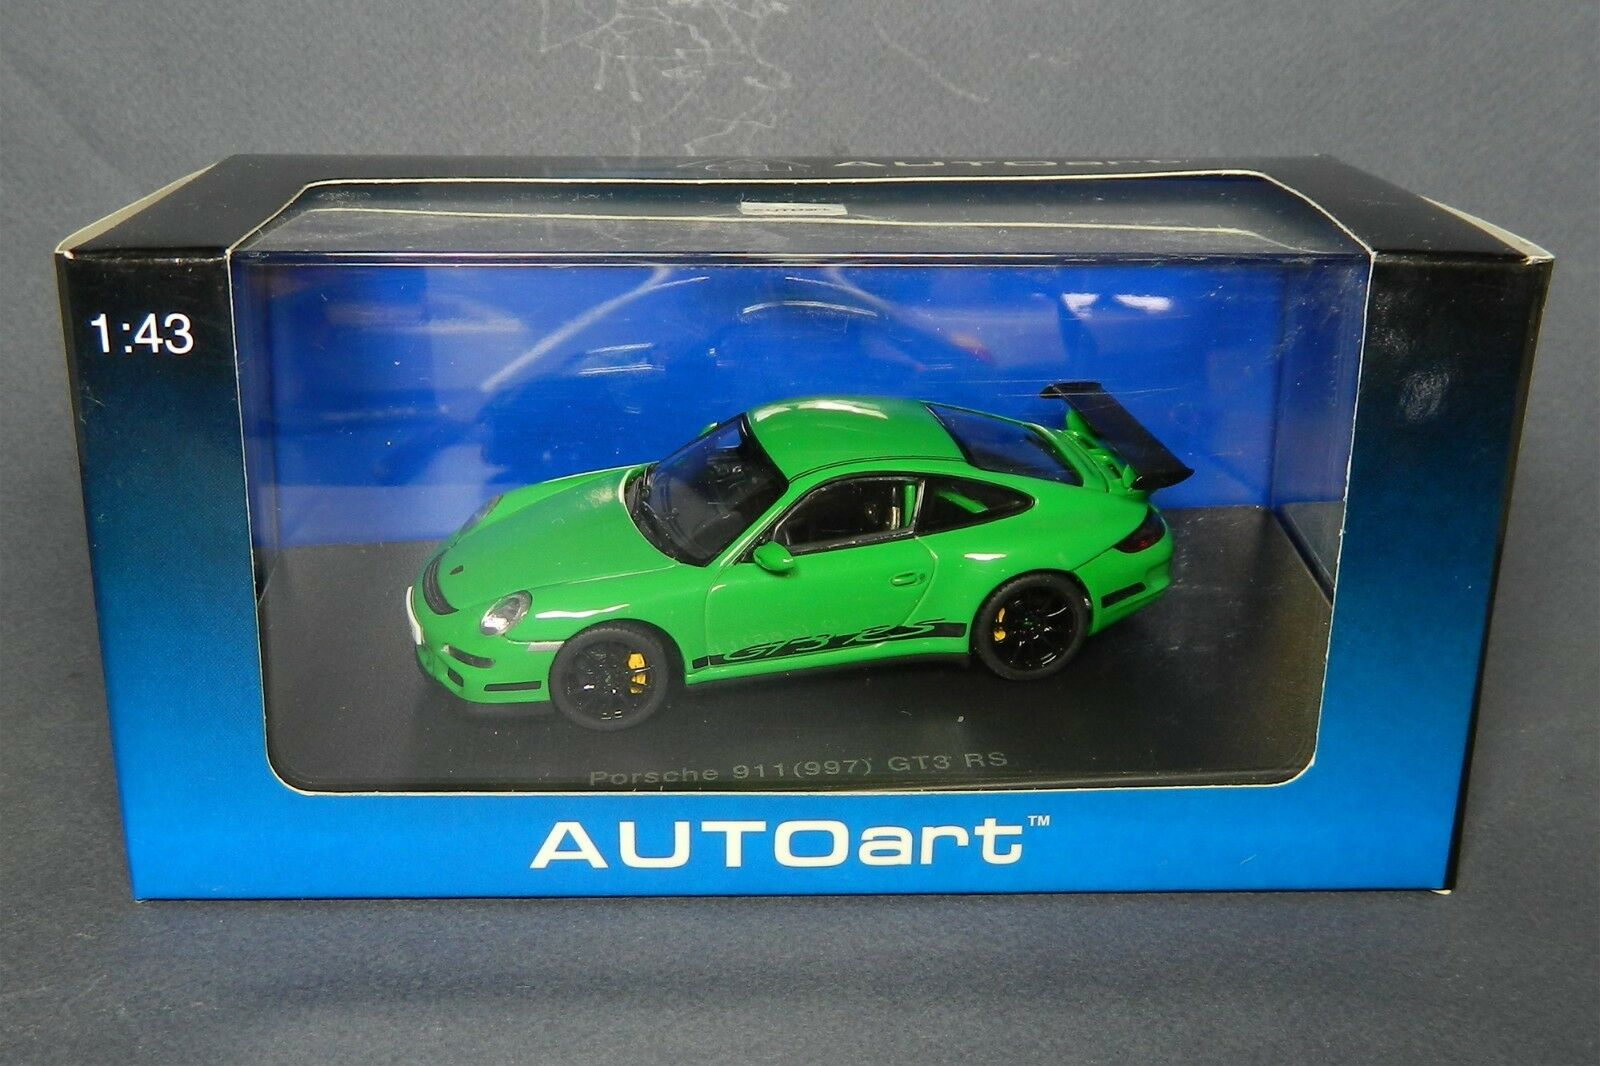 1 43 Porsche 911 GT3 GT3 GT3 RS 997 AUTOart 57912 Very RARE diecast 1 43 scale car Auto 40a4c2